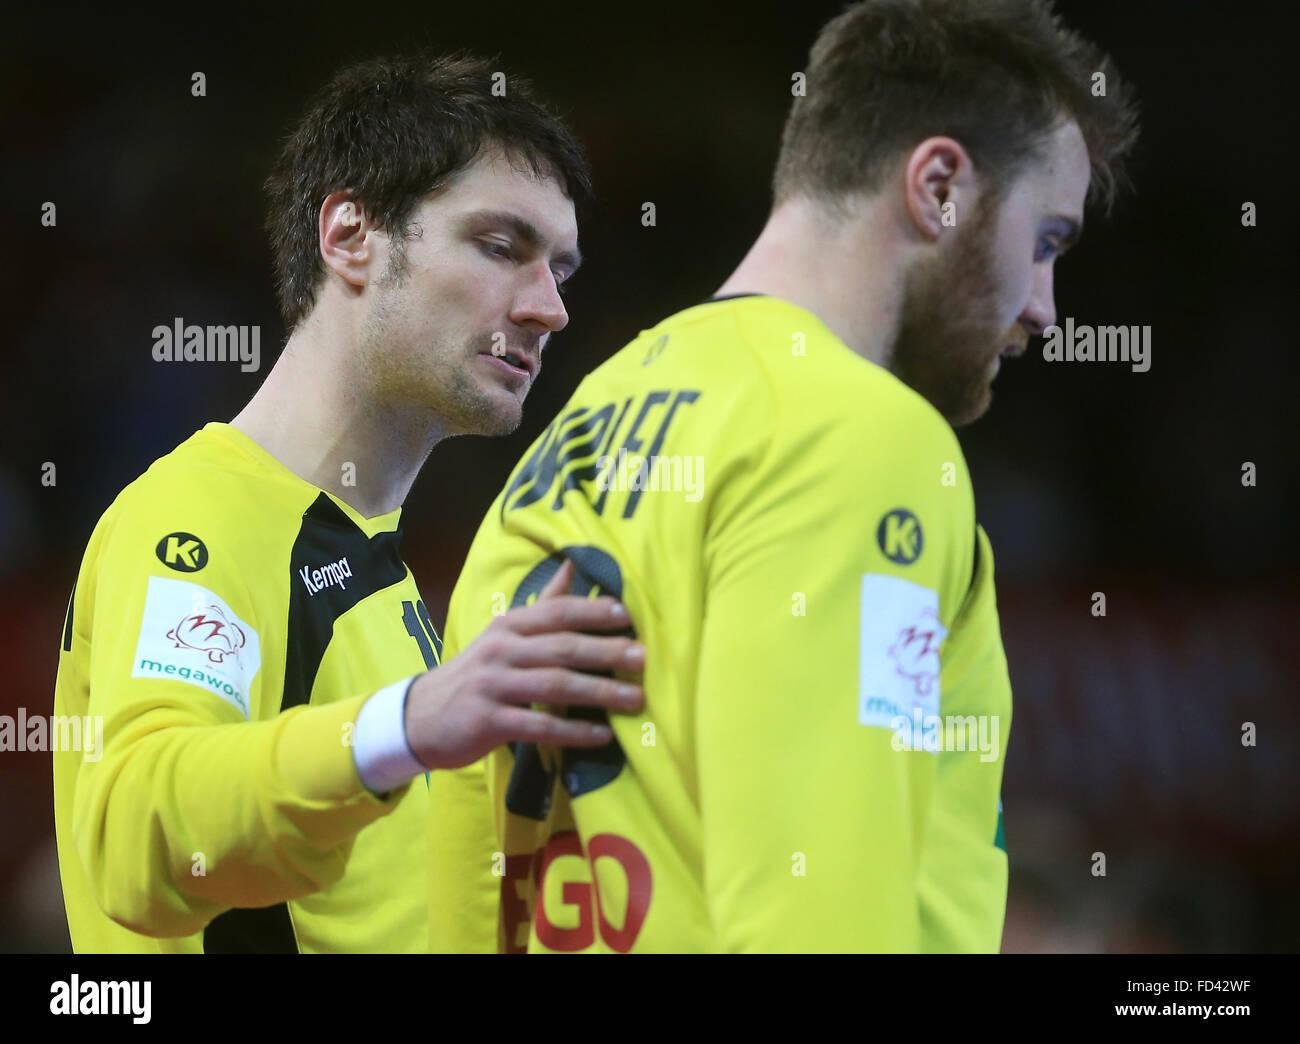 1b71b0696a7056 Germany s goalkeeper Carsten Lichtlein (L) coaches team mate Andreas Wolff  during the 2016 Men s European Championship handball group 2 match between  ...